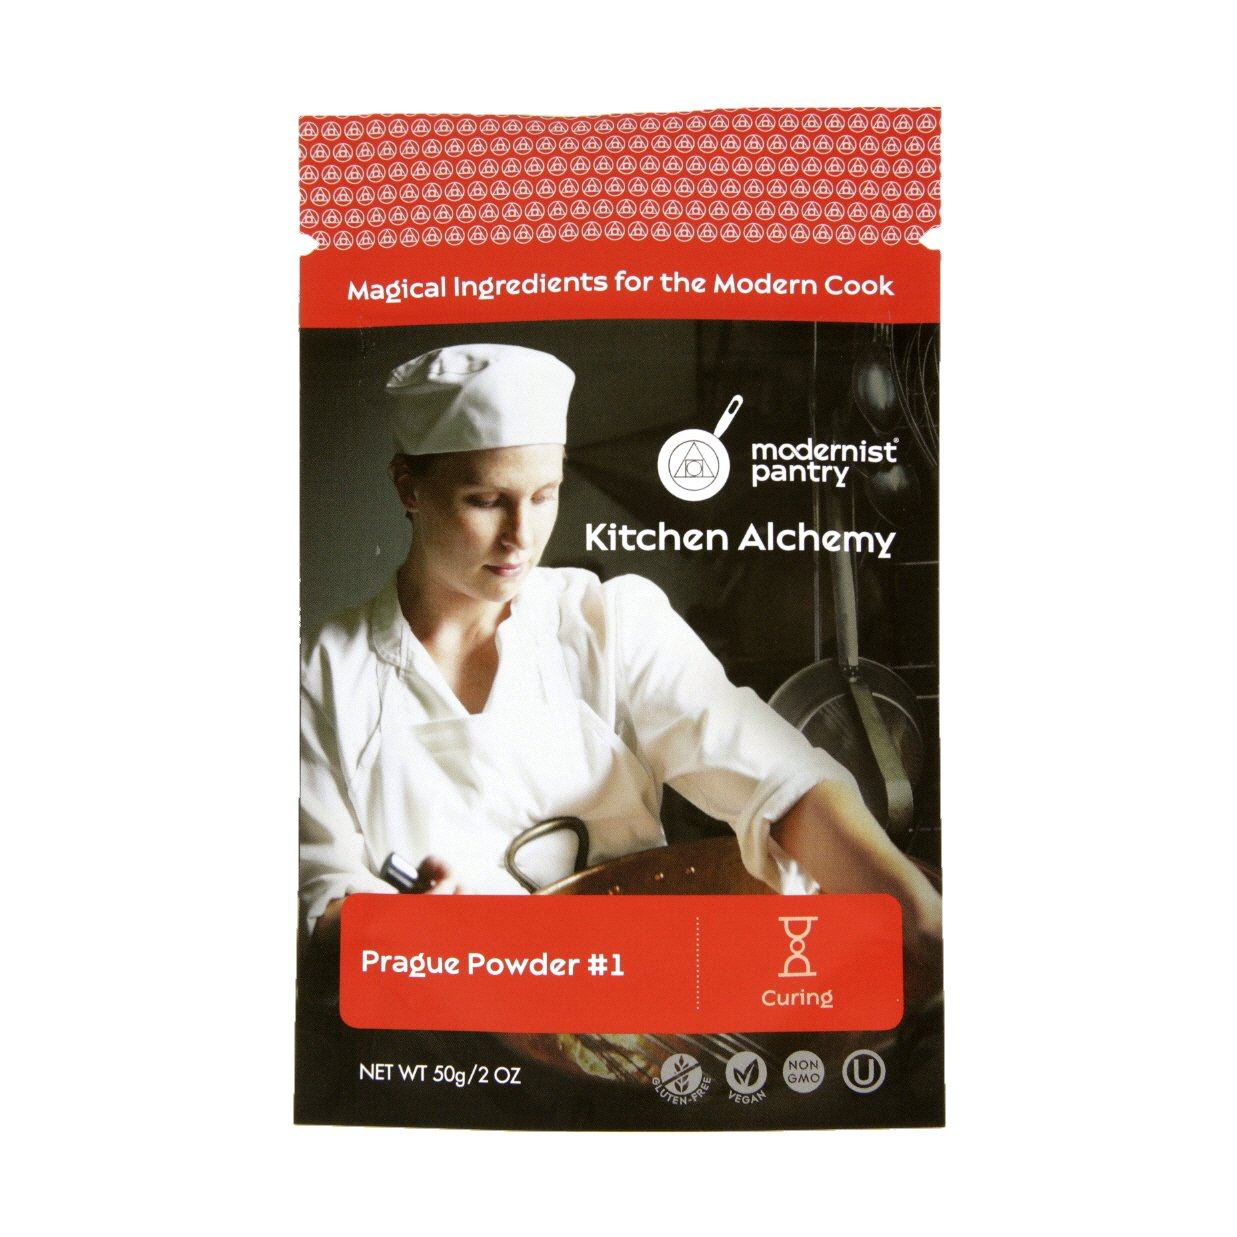 Pure Prague Powder #1 [aka Insta Cure #1, DQ Pink Curing Salt, Sel Rose] ⊘ Non-GMO ❤ Gluten-Free ✡ OU Kosher Certified - 50g/2oz